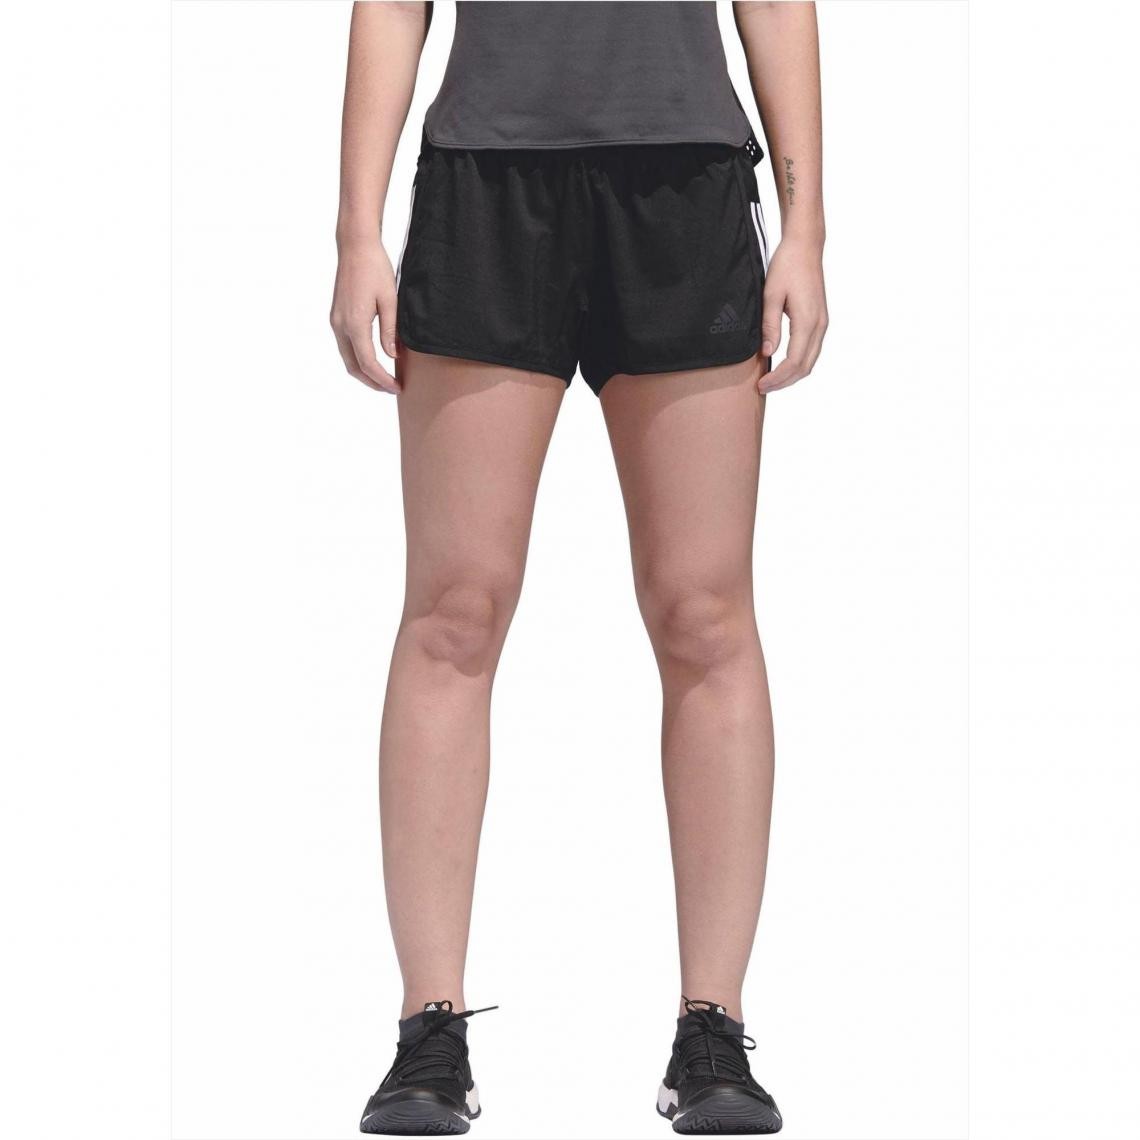 vetement sport femme adidas